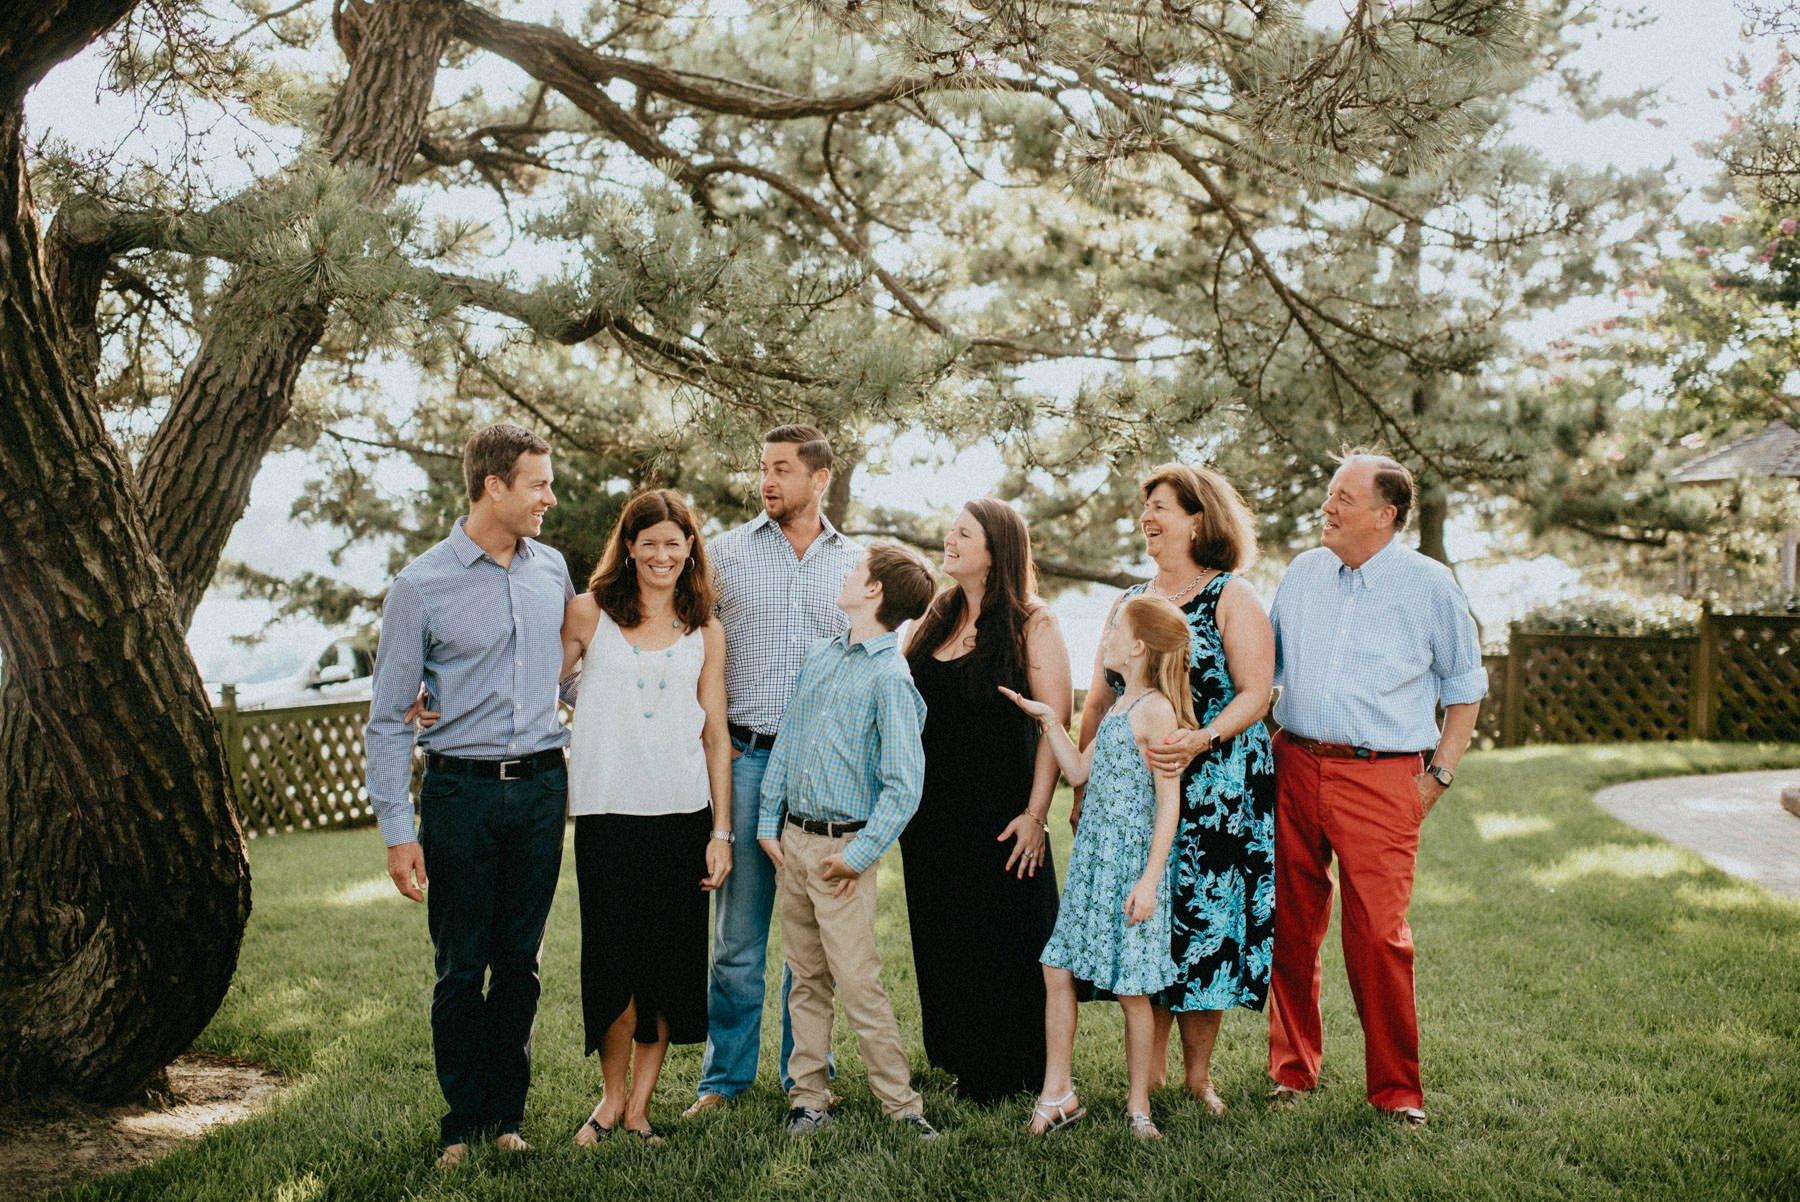 delware-pennsylvania-family-photographer-29.jpg